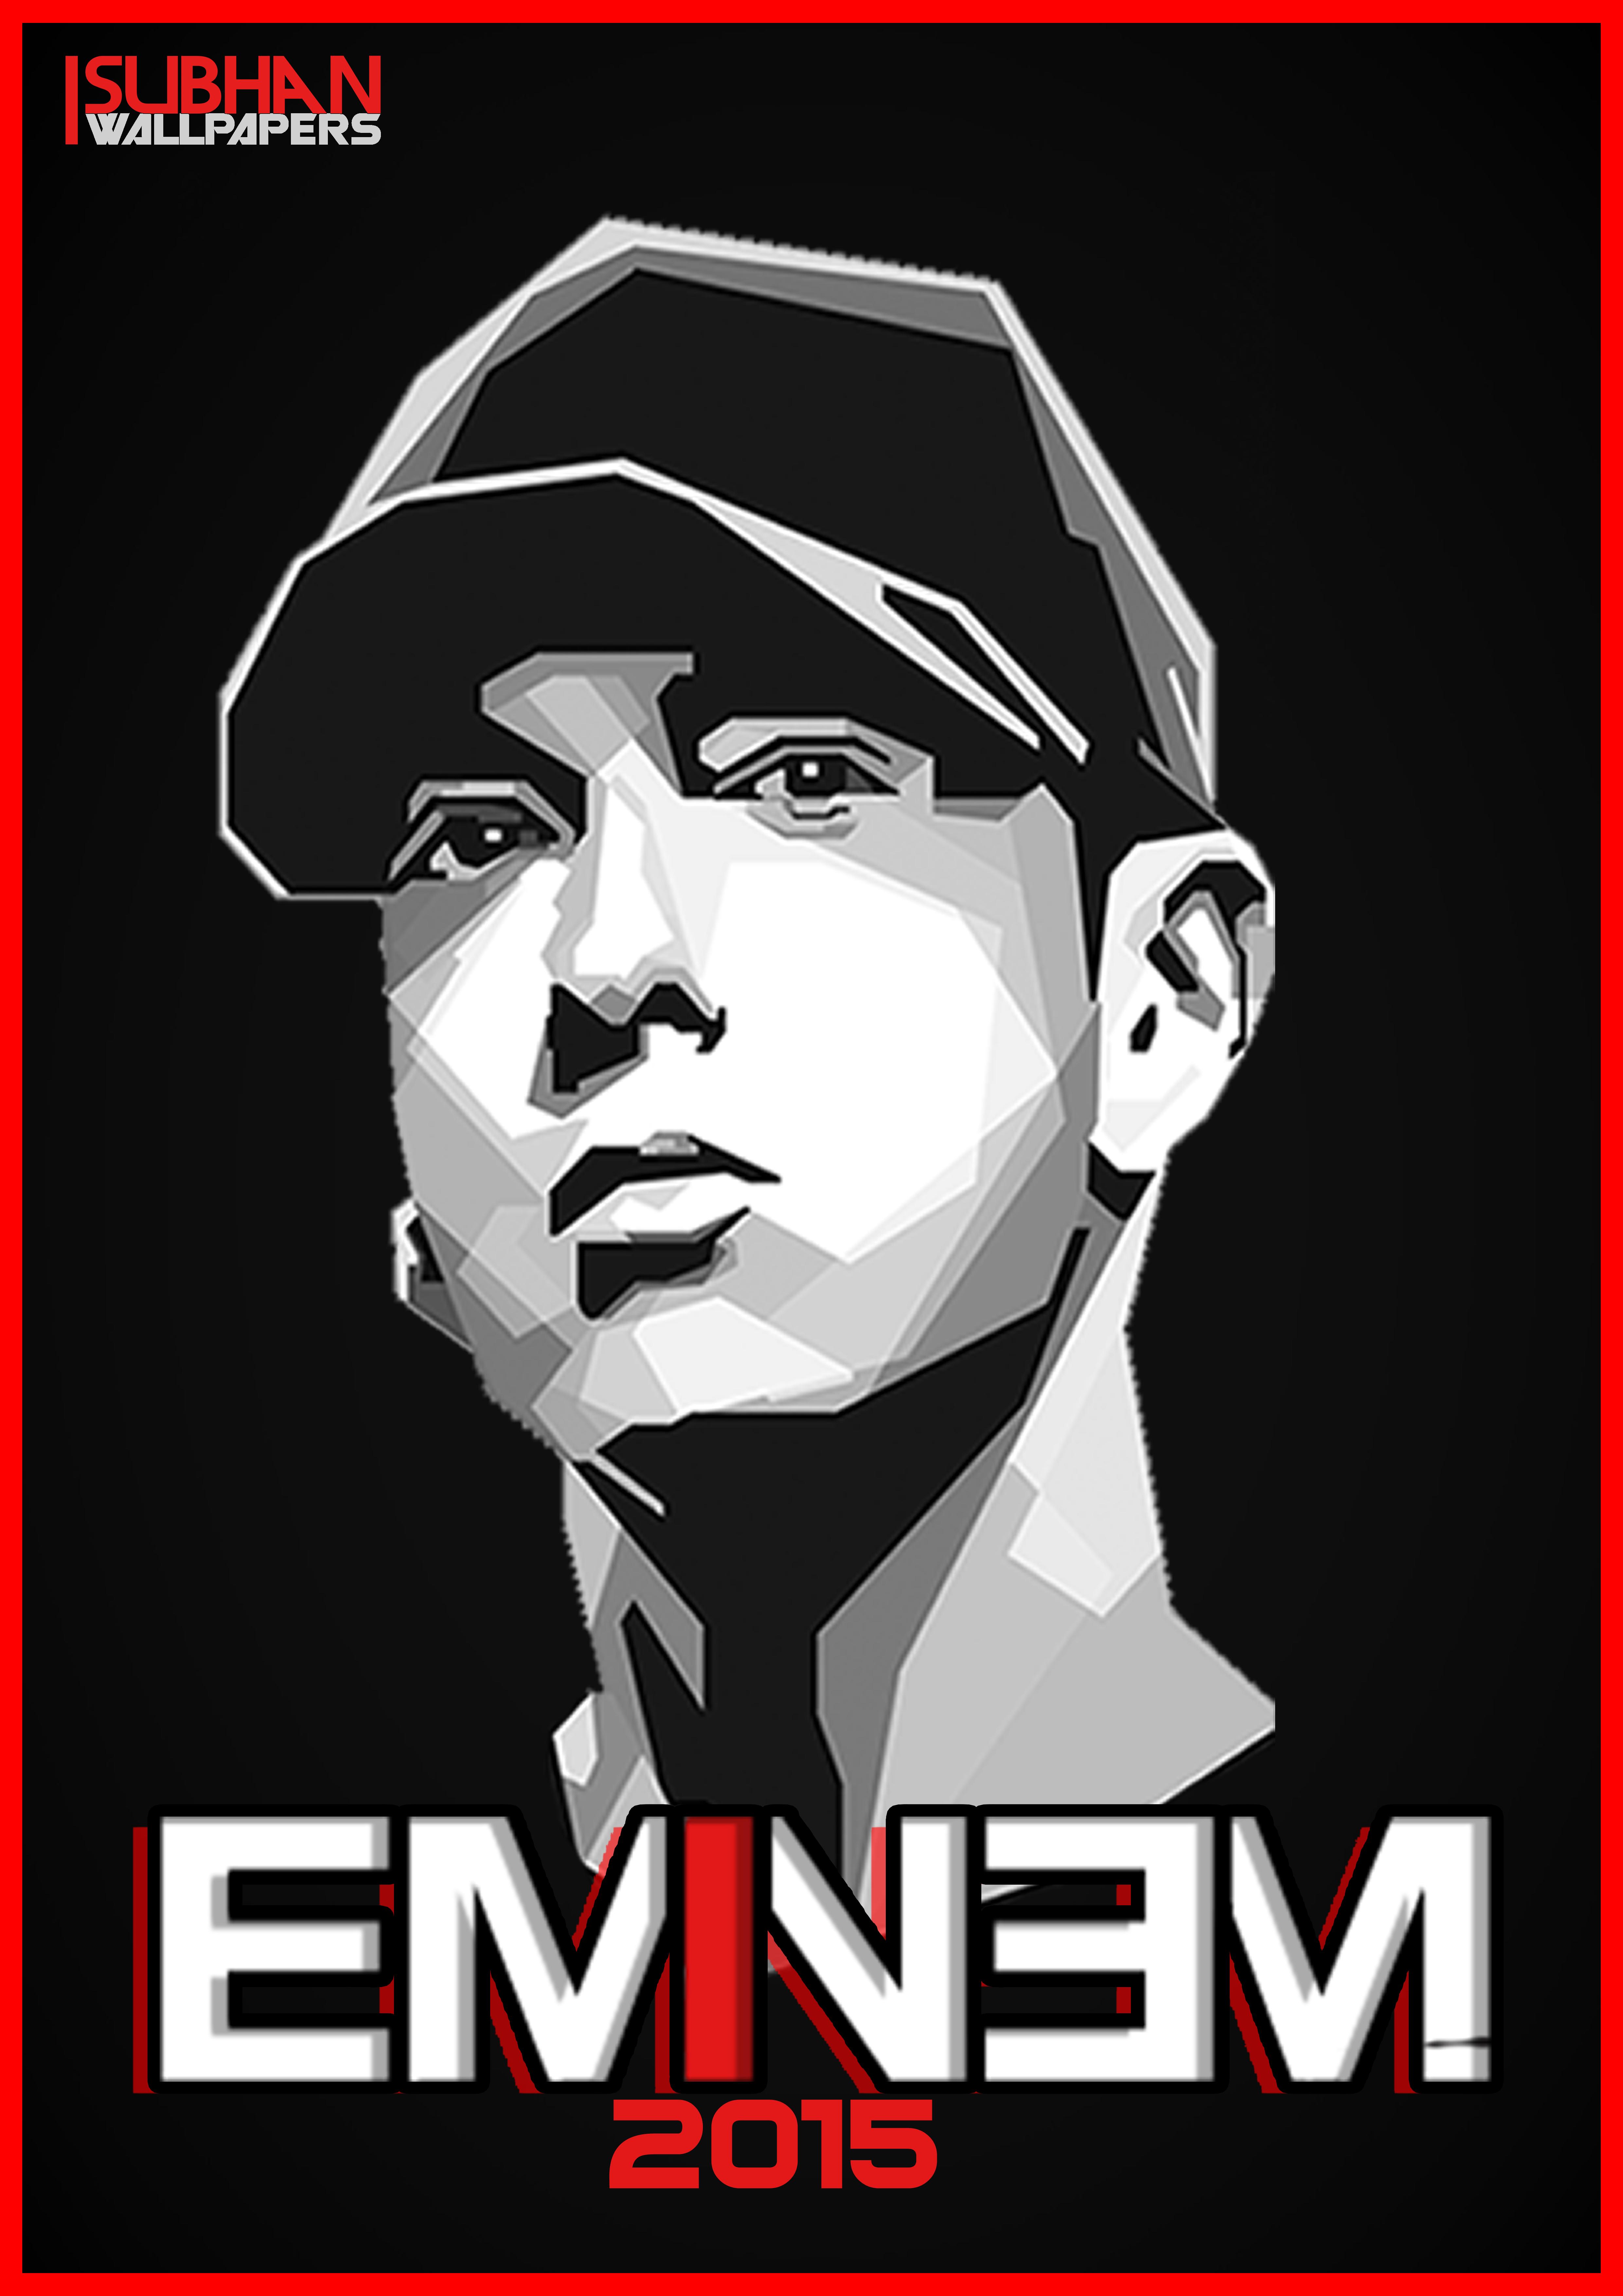 Eminem by subhan22 on DeviantArt